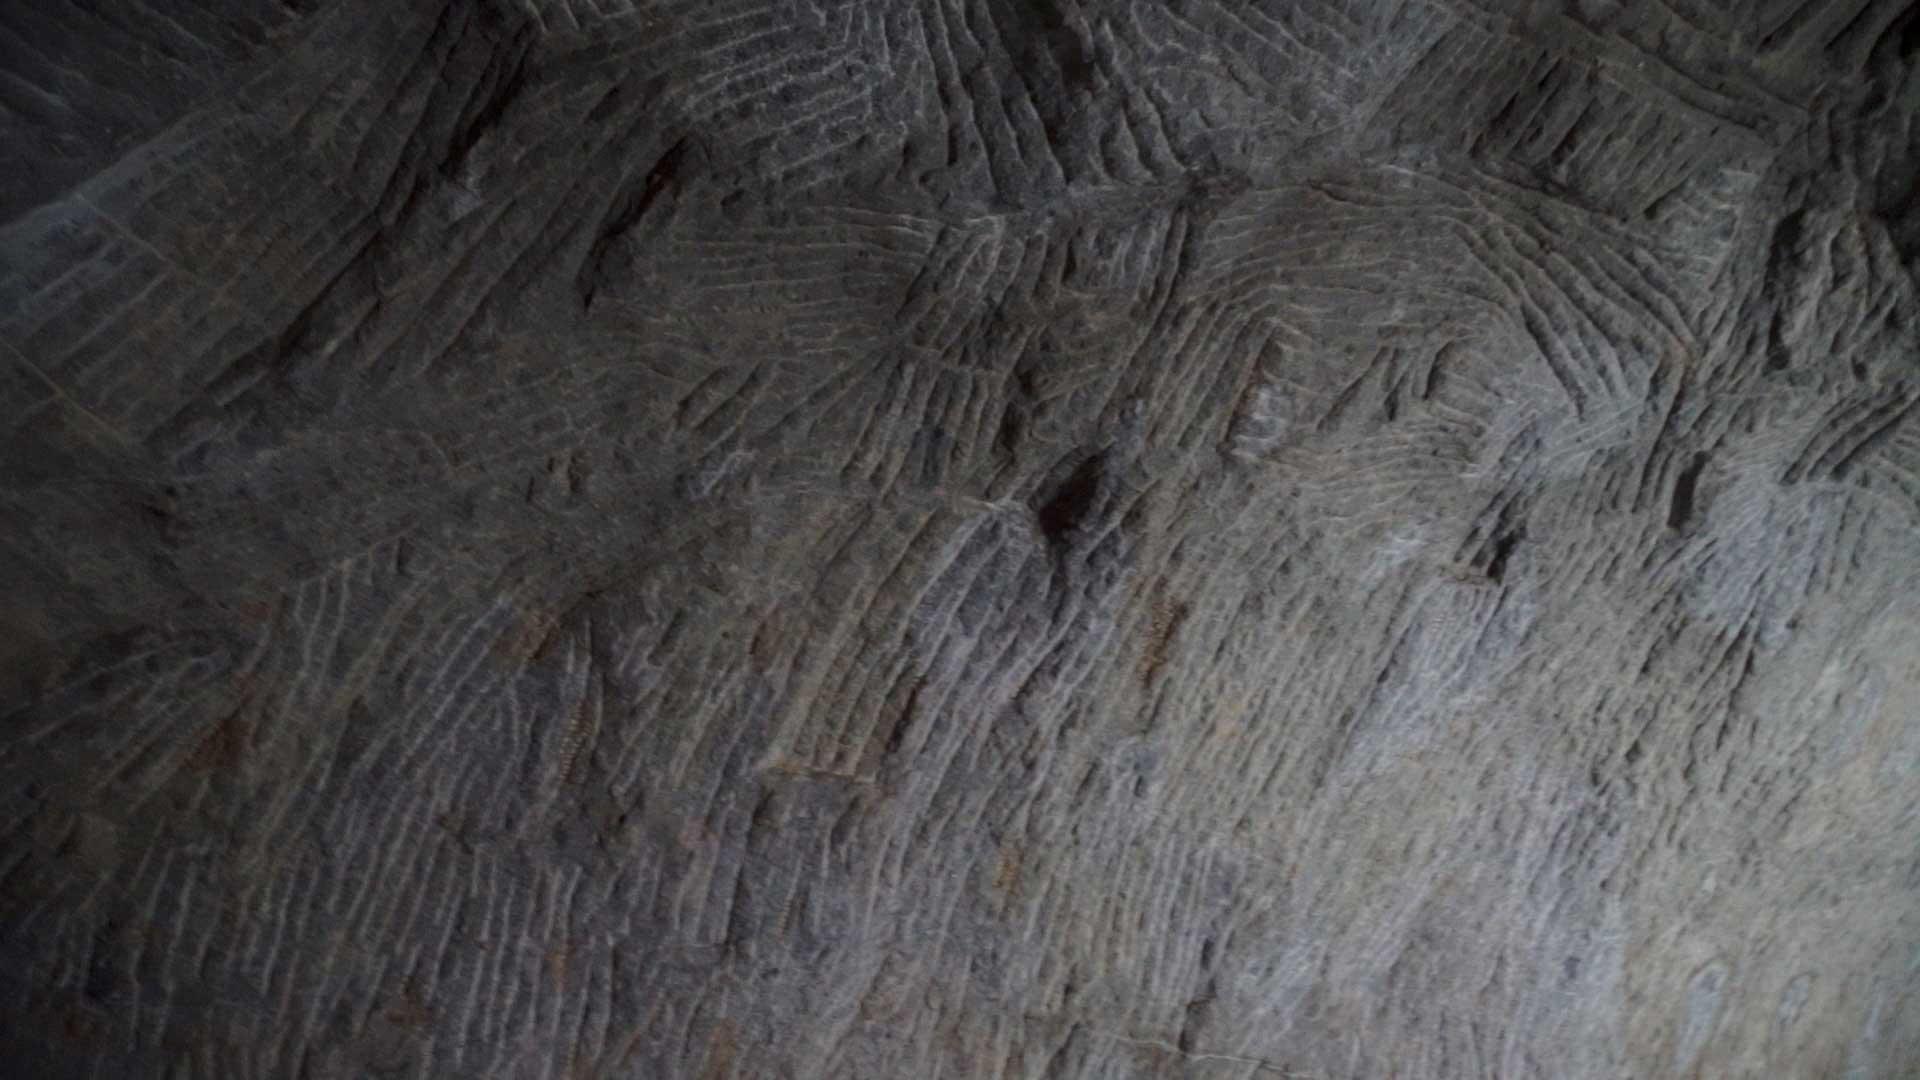 Barabar-BAM-film-granit-miroir-pyramide-inde-yoga-archeologie-15